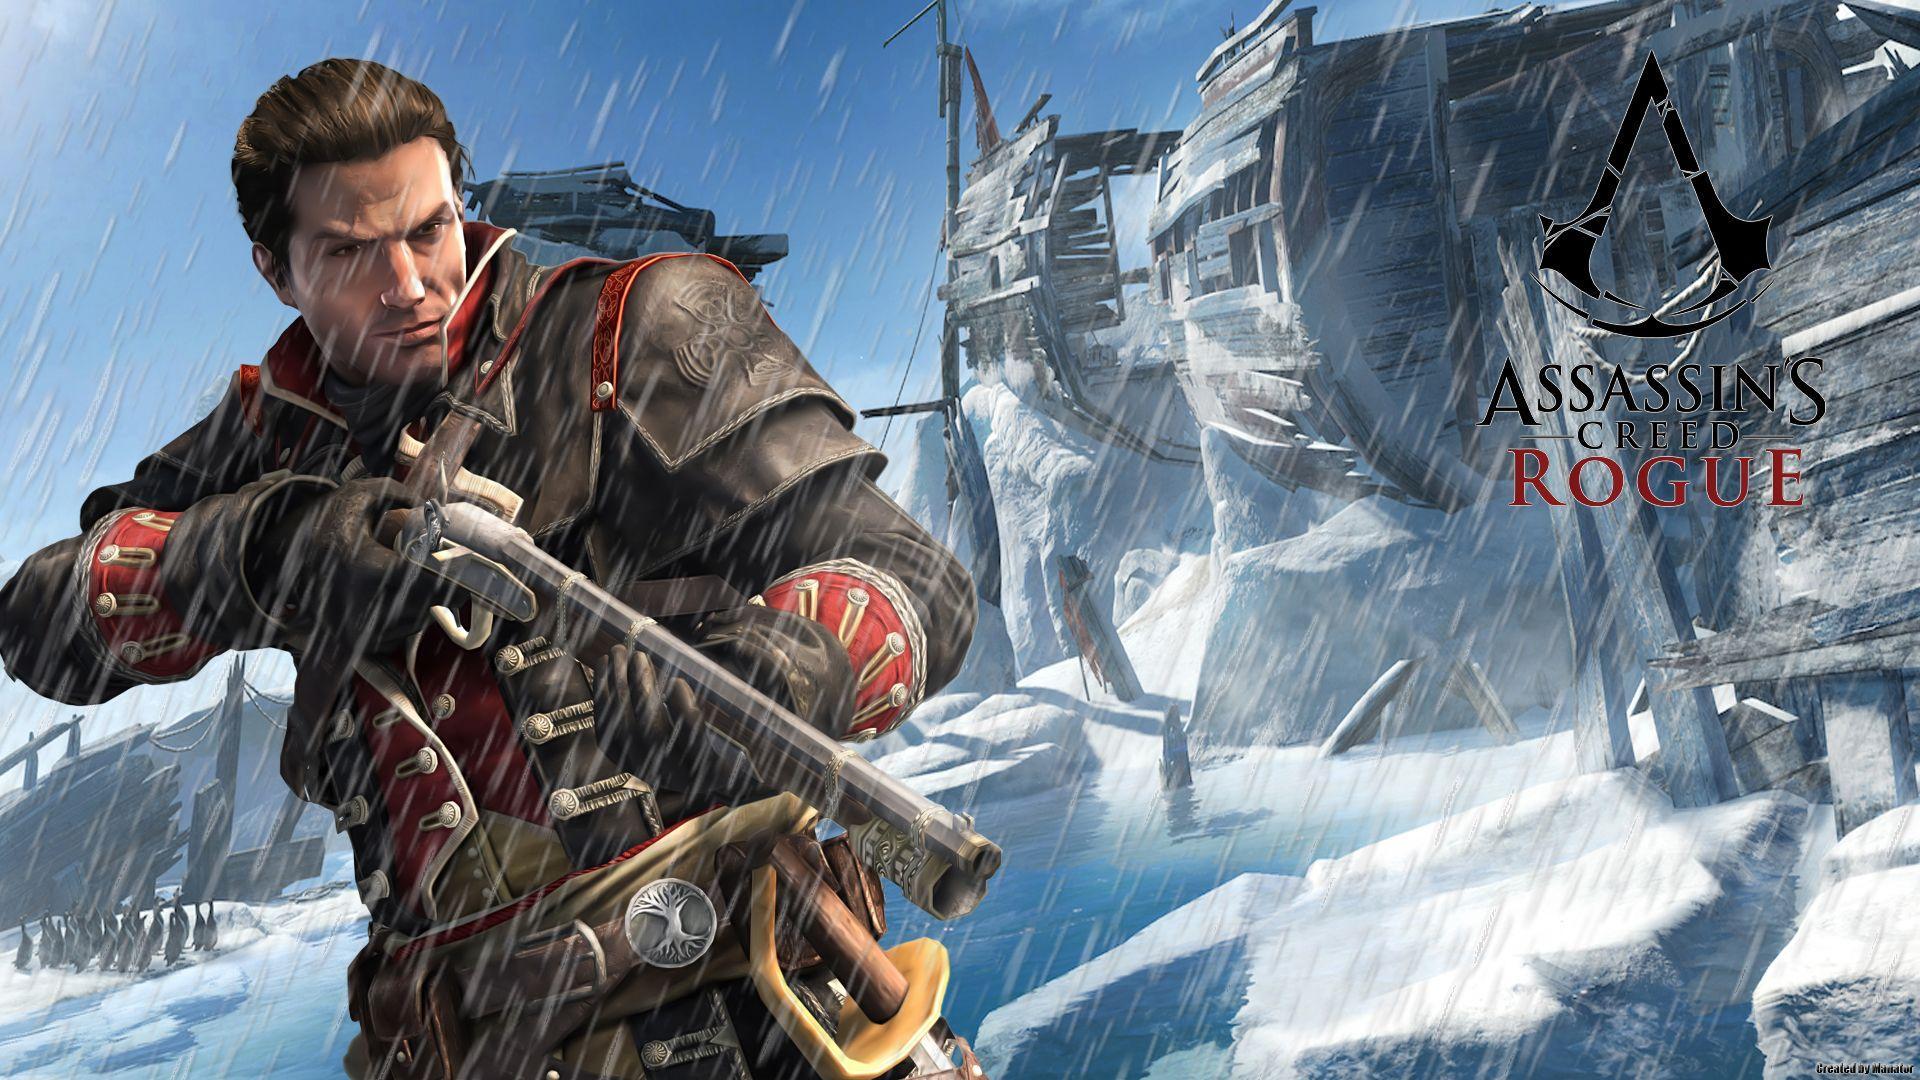 Assassin's Creed Rogue Wallpapers - Wallpaper Cave